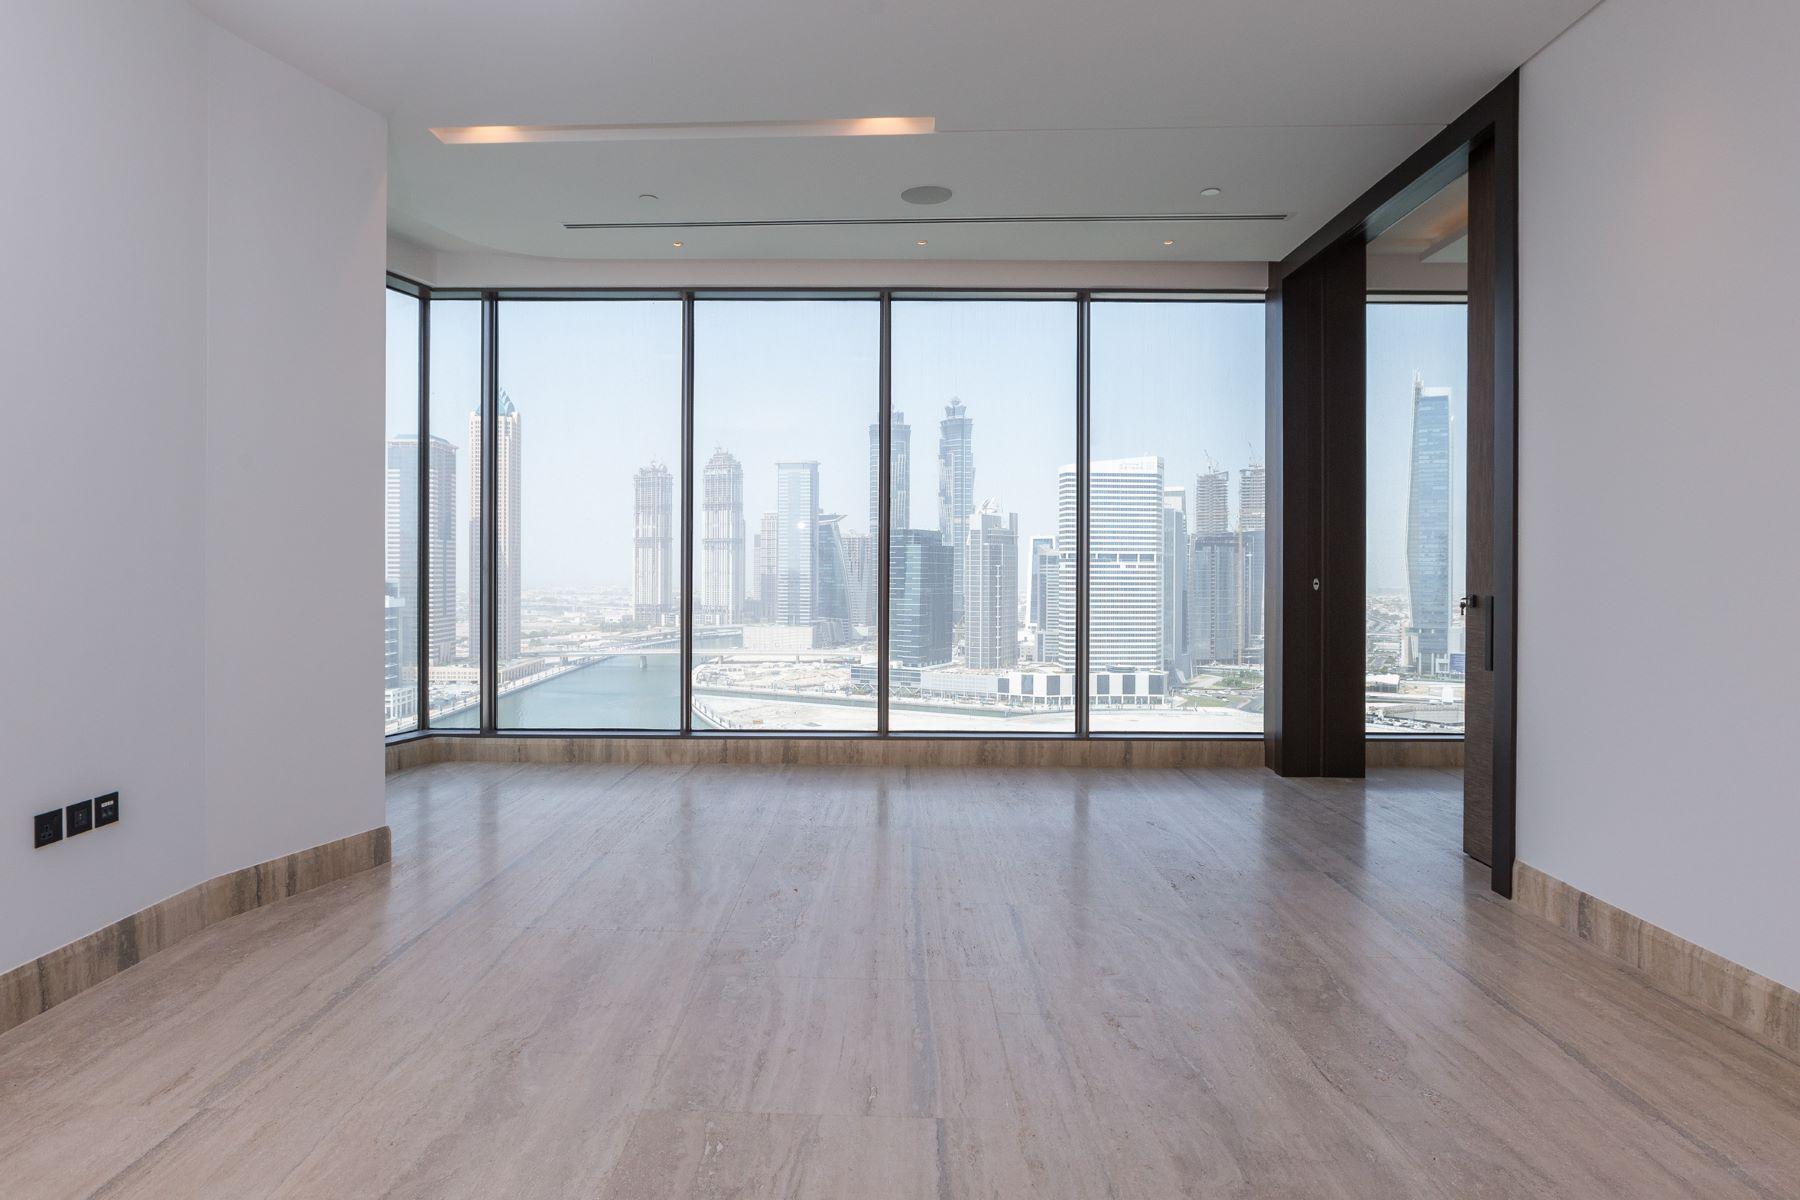 Apartments for Sale at Unfurnished Ultra Luxurious Full Floor Dubai, Dubai United Arab Emirates